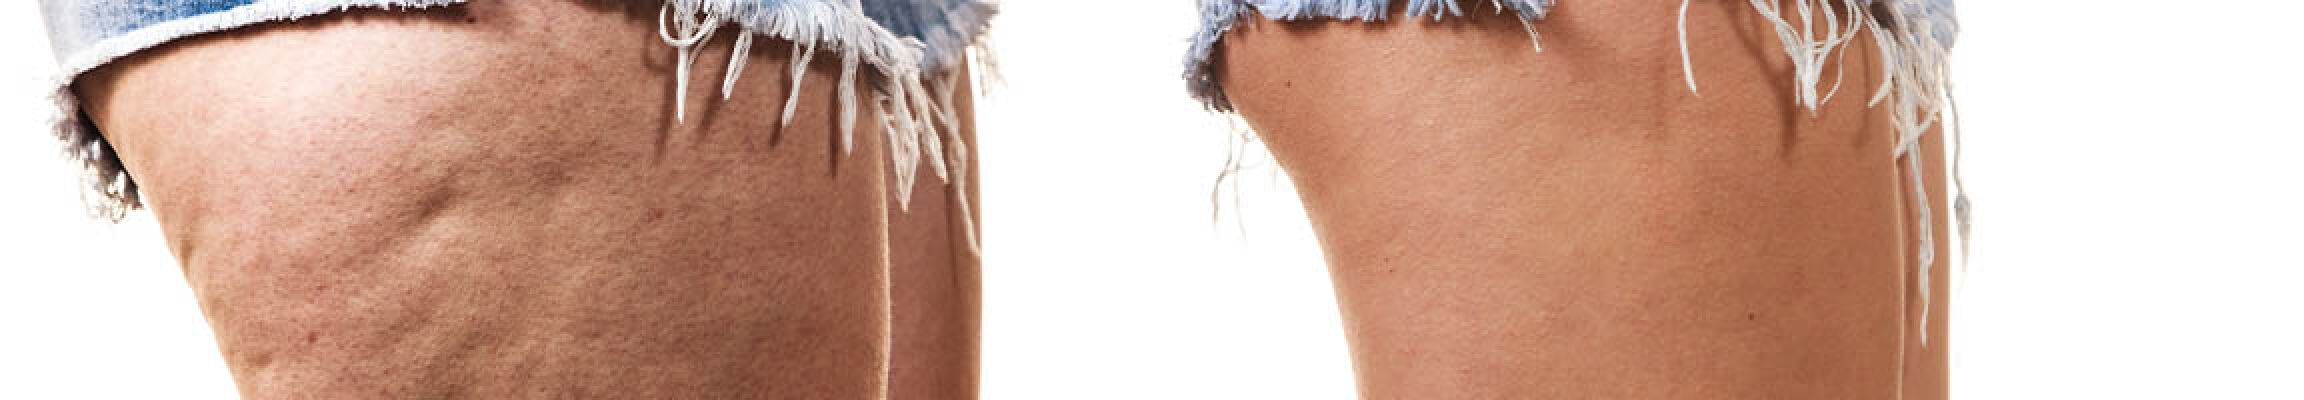 Faszientraining gegen Cellulite